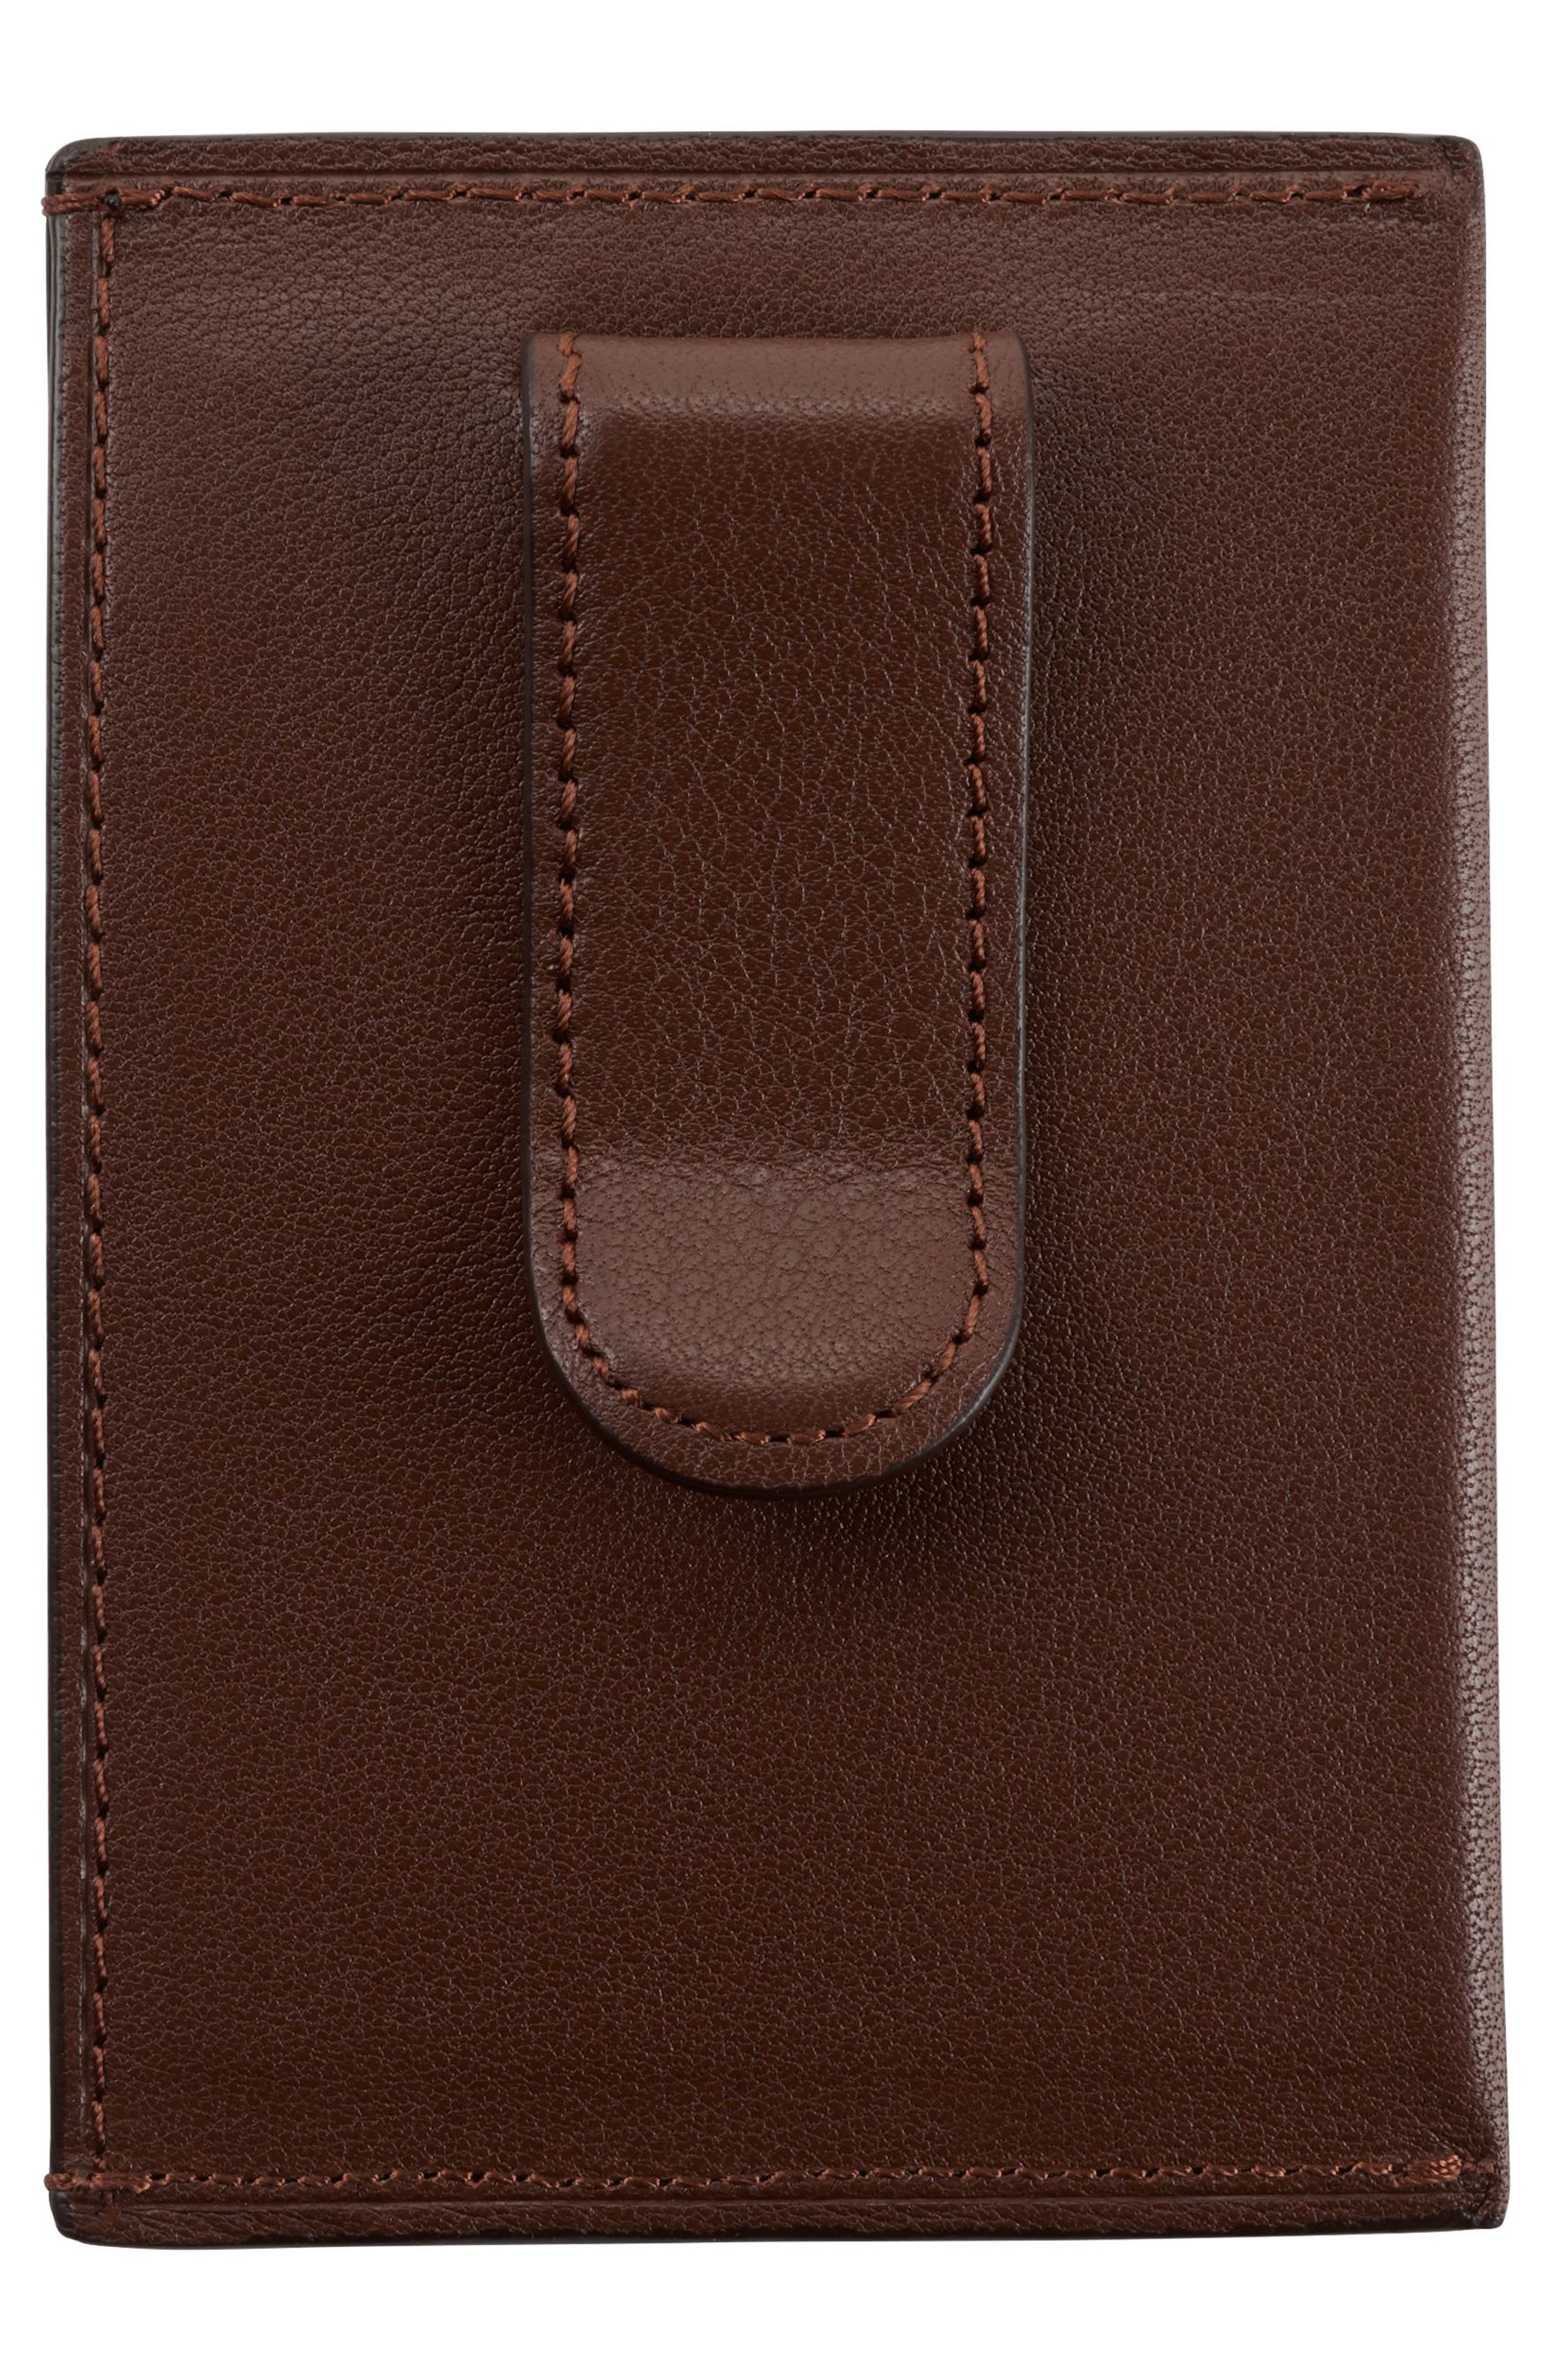 Leather Money Clip Card Case,                             Alternate thumbnail 4, color,